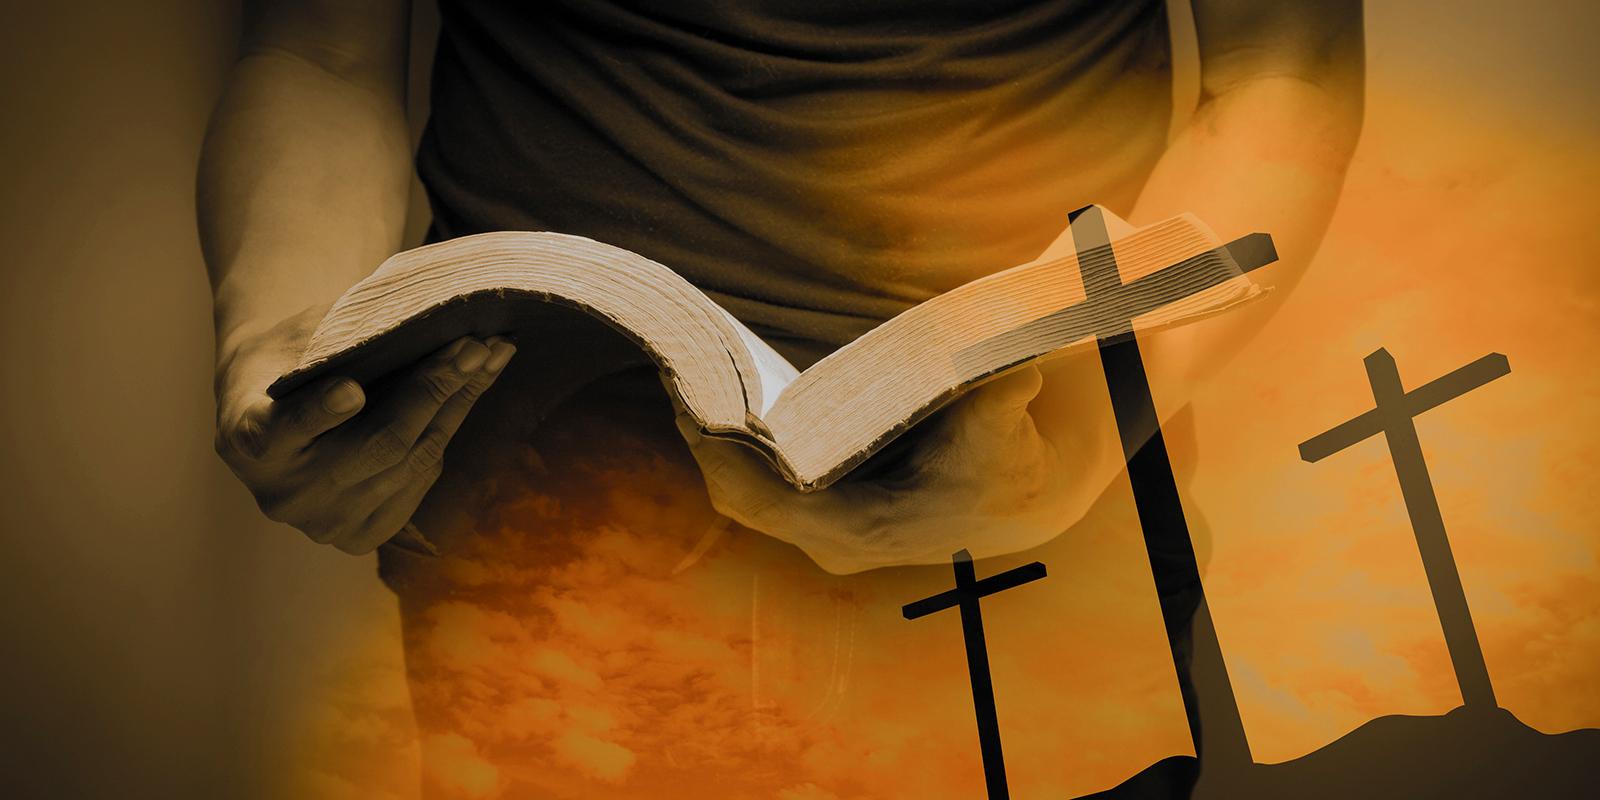 omega_bible_study2